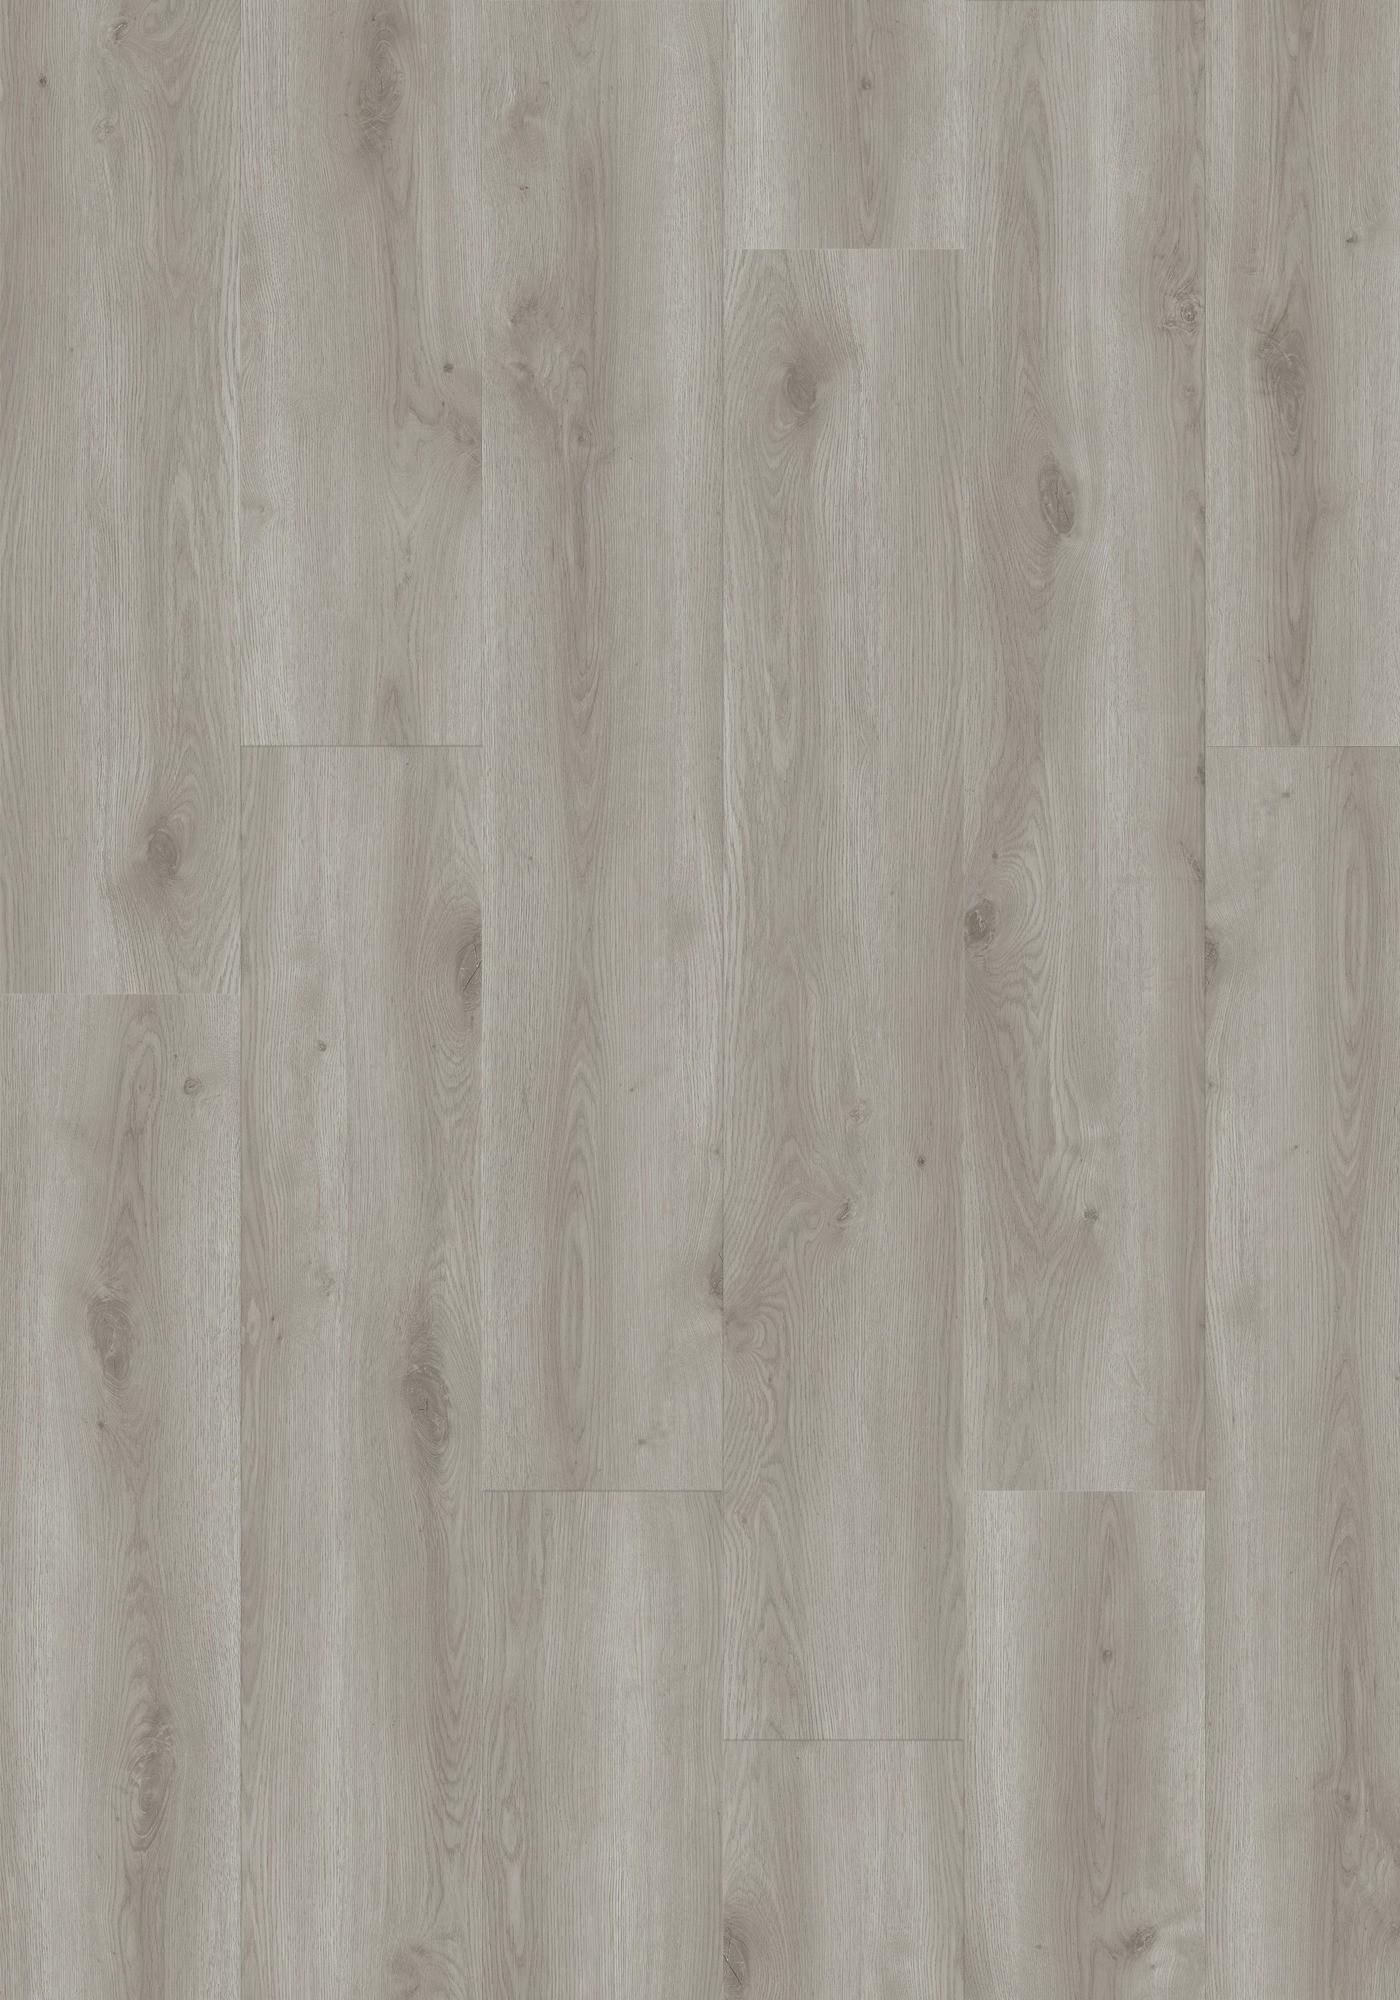 Tarkett XXL PVC Laminaat Oak Grey 24265109 150cm X 24cm brede